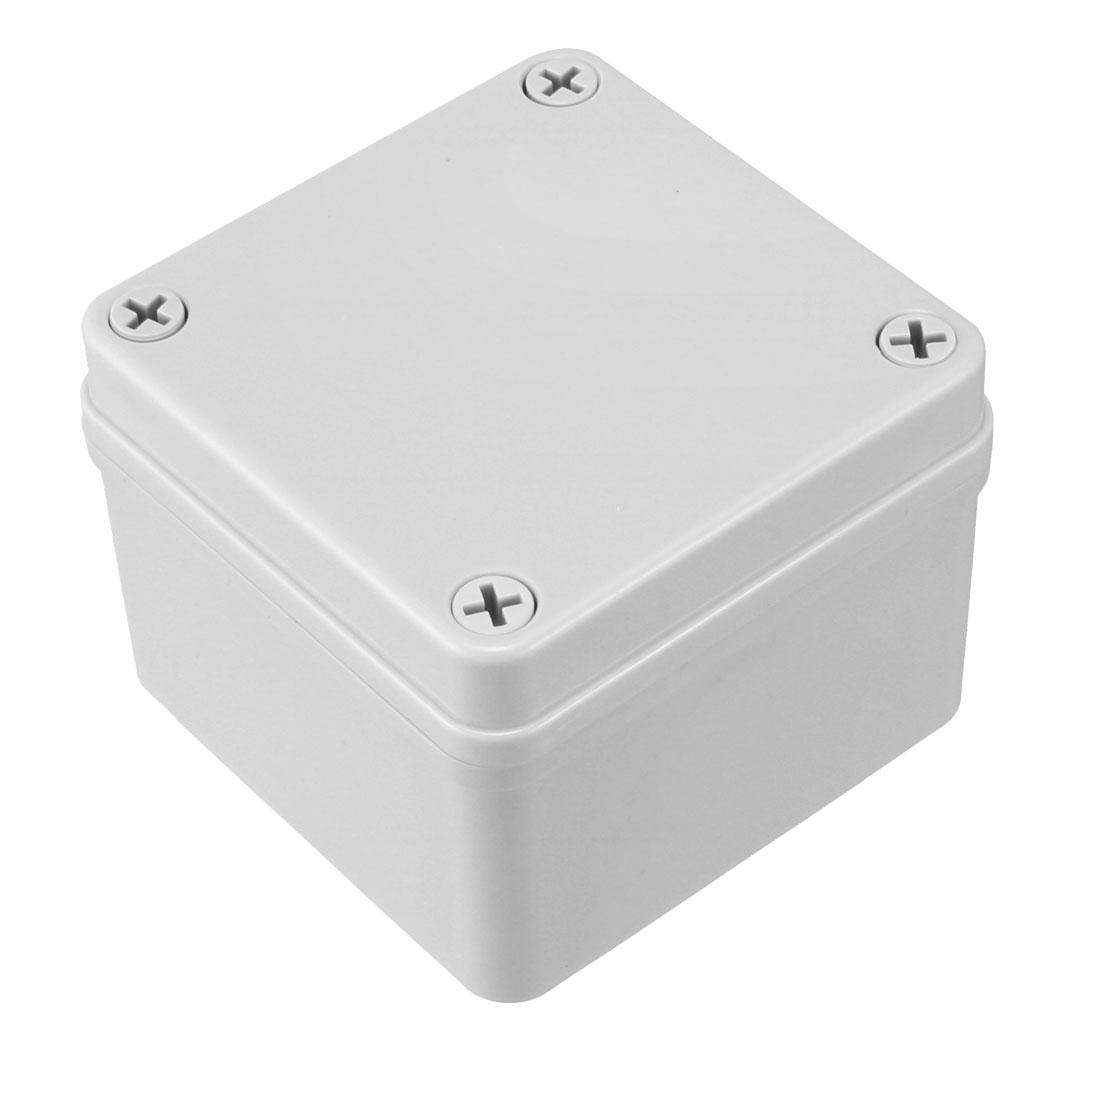 100 x 100 x 75mm Electronic ABS Plastic DIY Junction Box Enclosure Case Grey